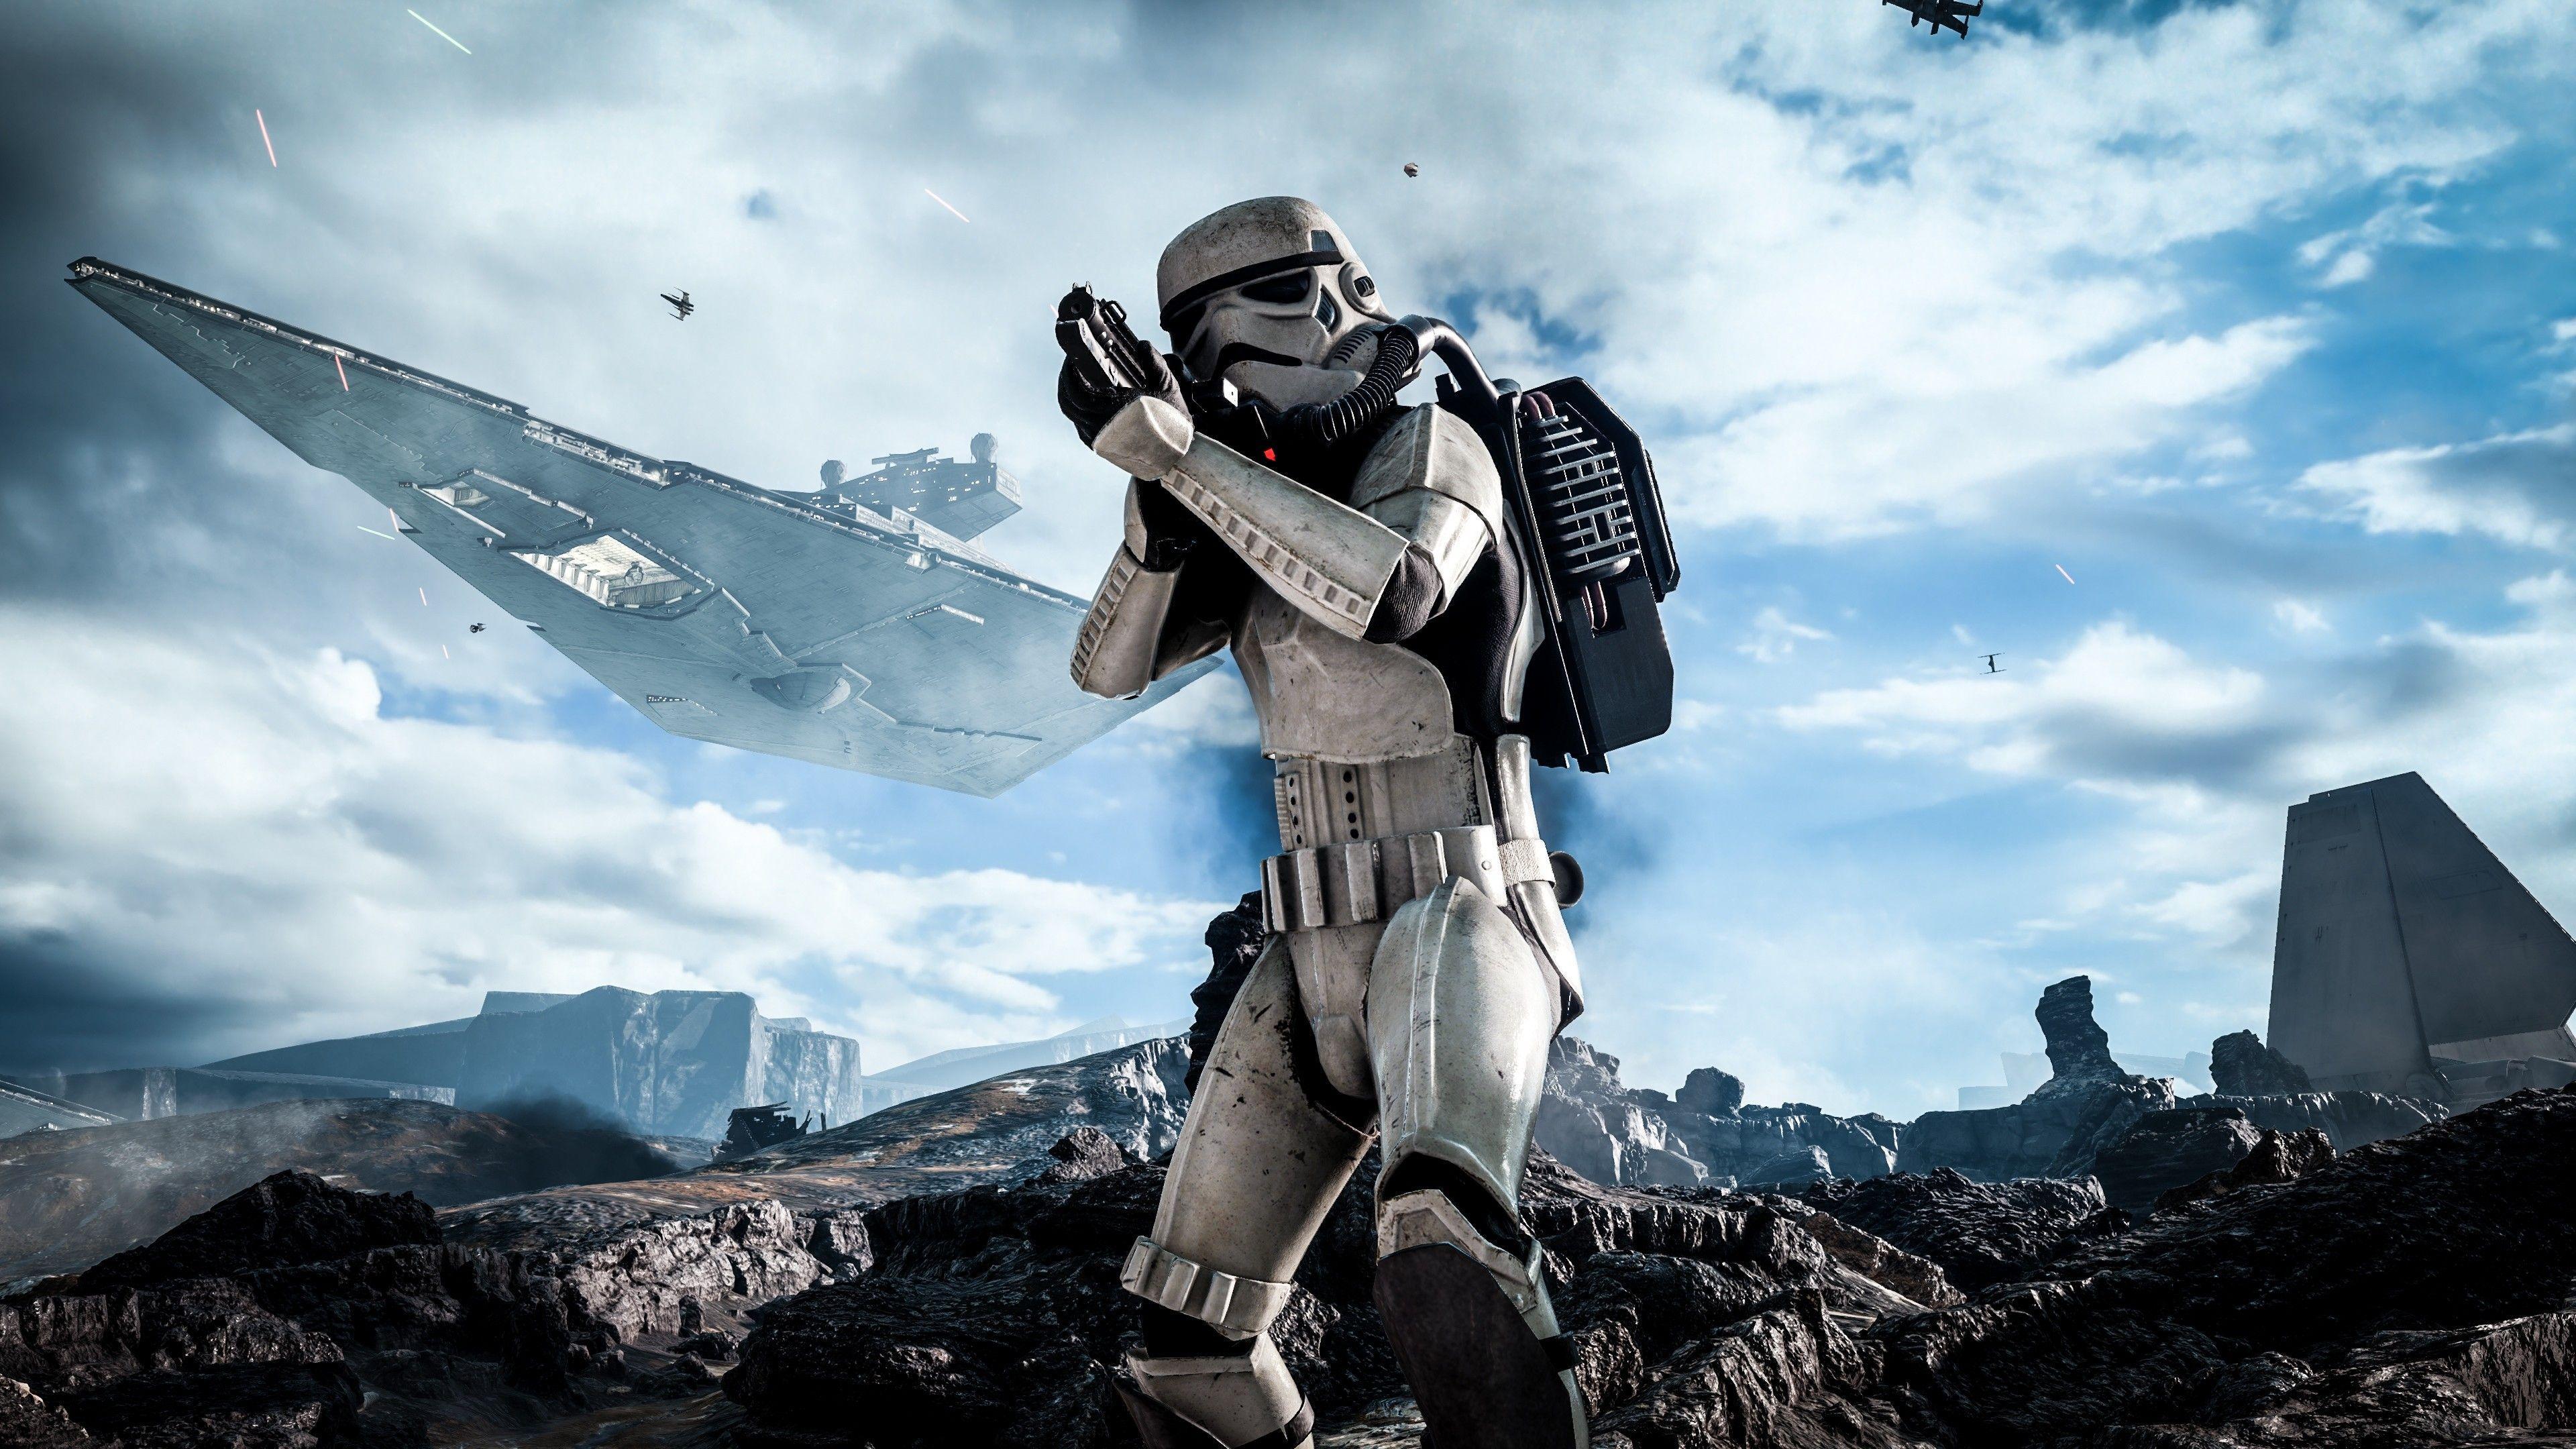 Star Wars 4K HD Wallpapers - Top Free Star Wars 4K HD ...